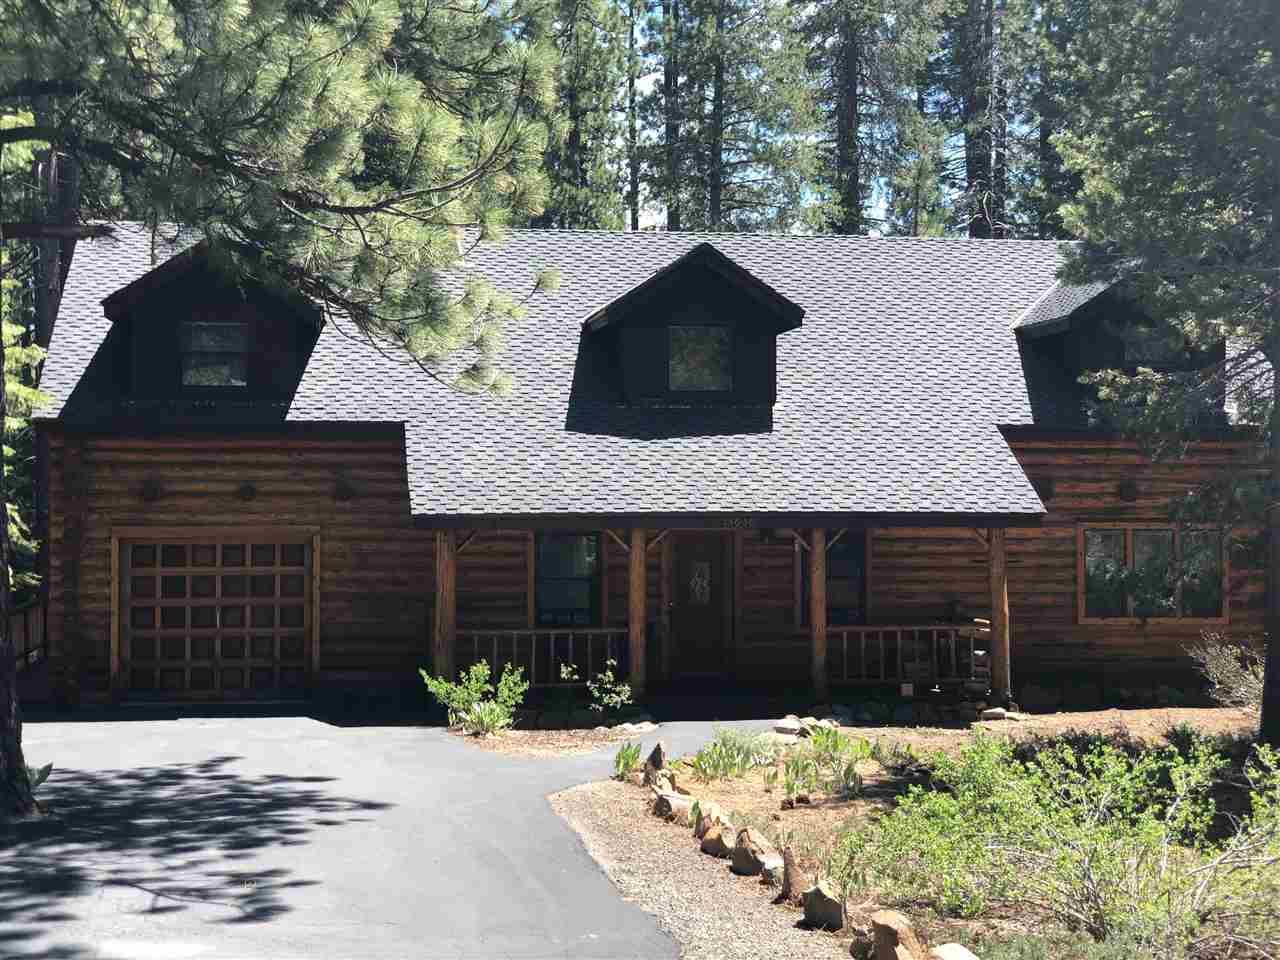 Image for 13630 Ski View Loop, Truckee, CA 96161